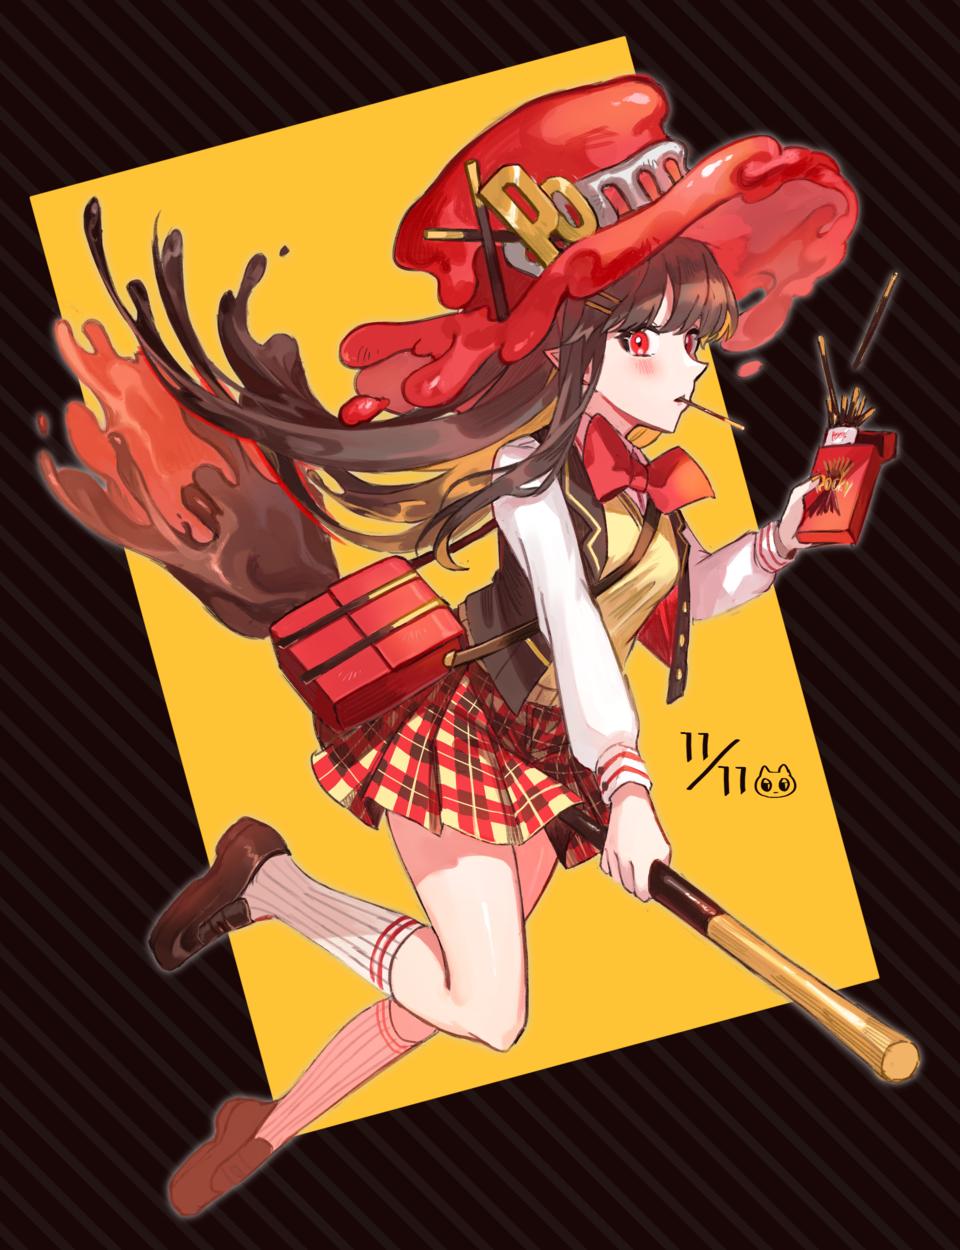 1111 Illust of 四鈴あざな medibangpaint original witch girl ポッキーの日